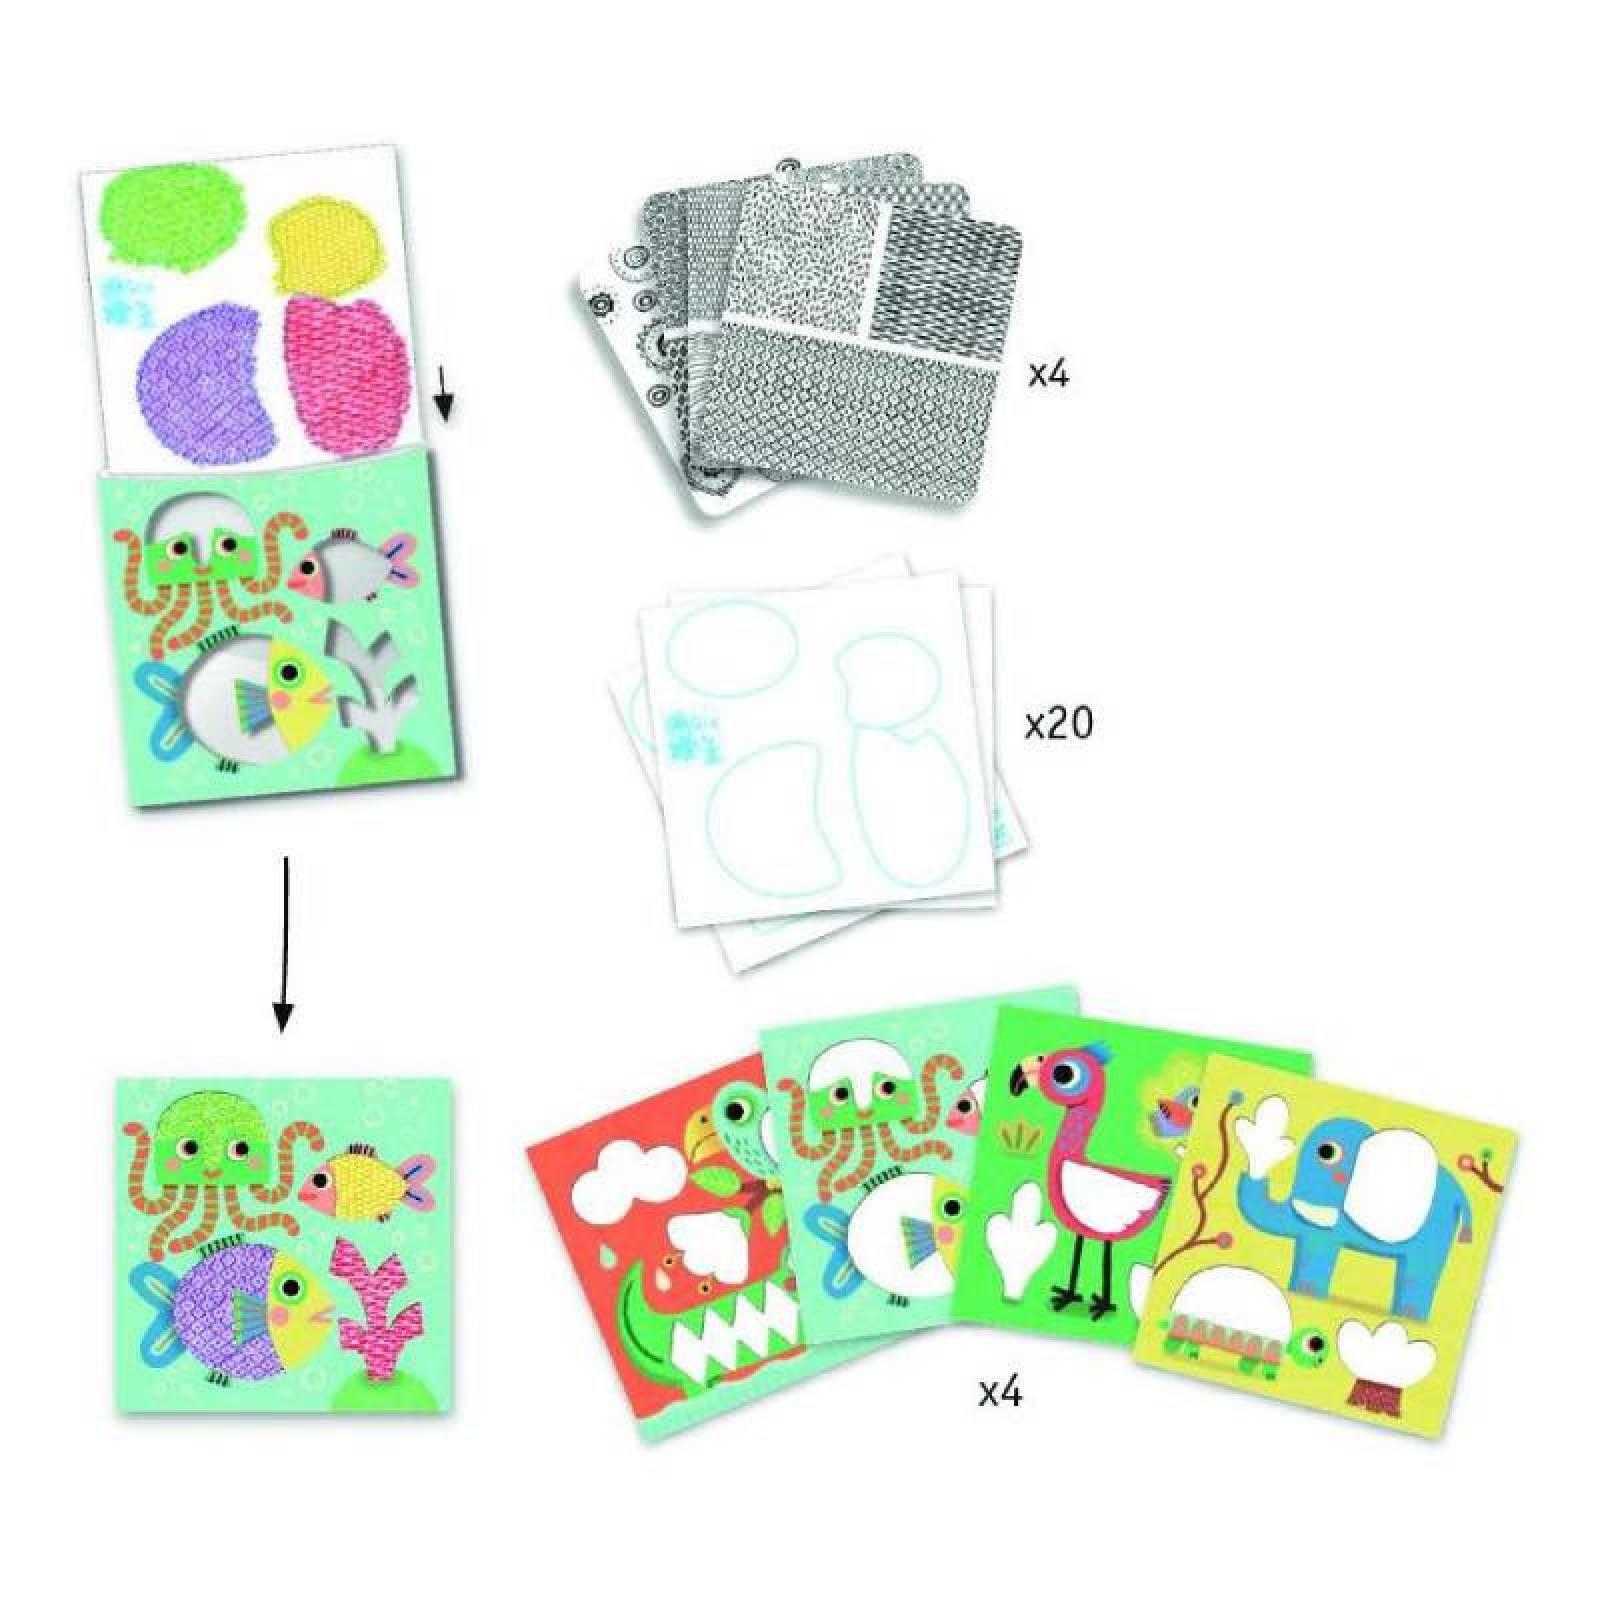 Magali's Friends - Pattern Rubbing Art Kit 3+ thumbnails